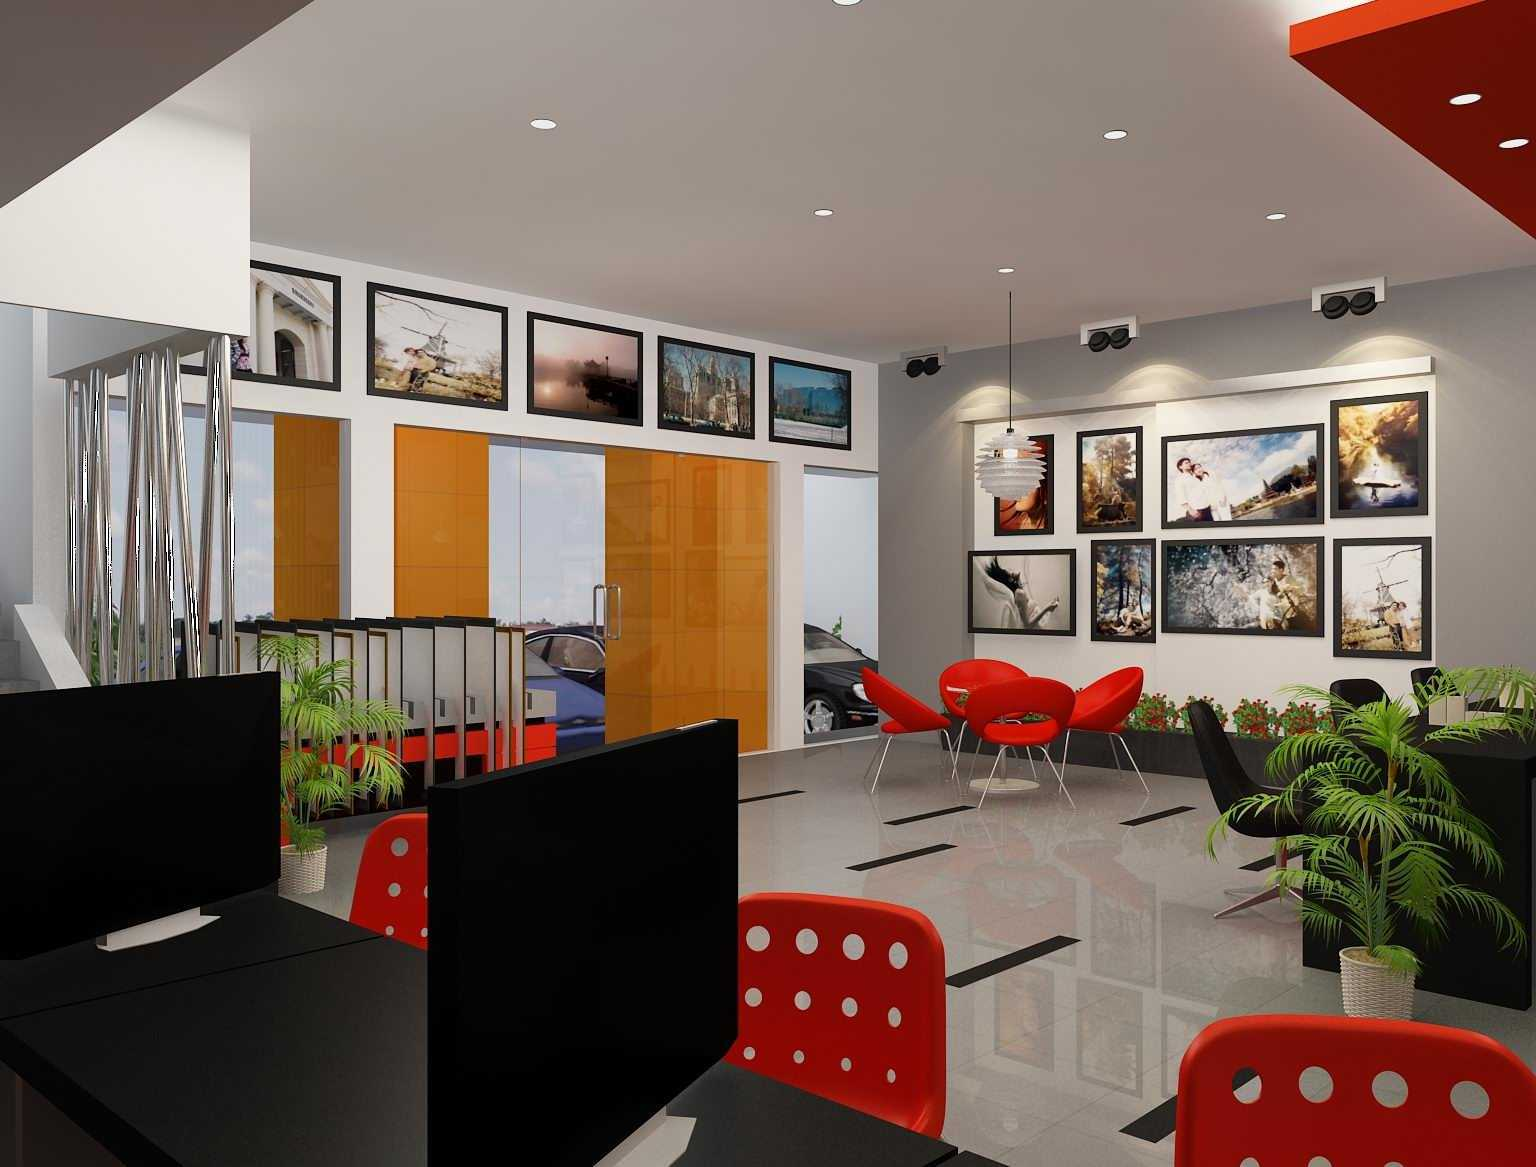 Conarch Studio Agatha Photography Surakarta, Kota Surakarta, Jawa Tengah, Indonesia Surakarta, Kota Surakarta, Jawa Tengah, Indonesia Conarch-Bangun-Sejahtera-Agatha-Photography  81912